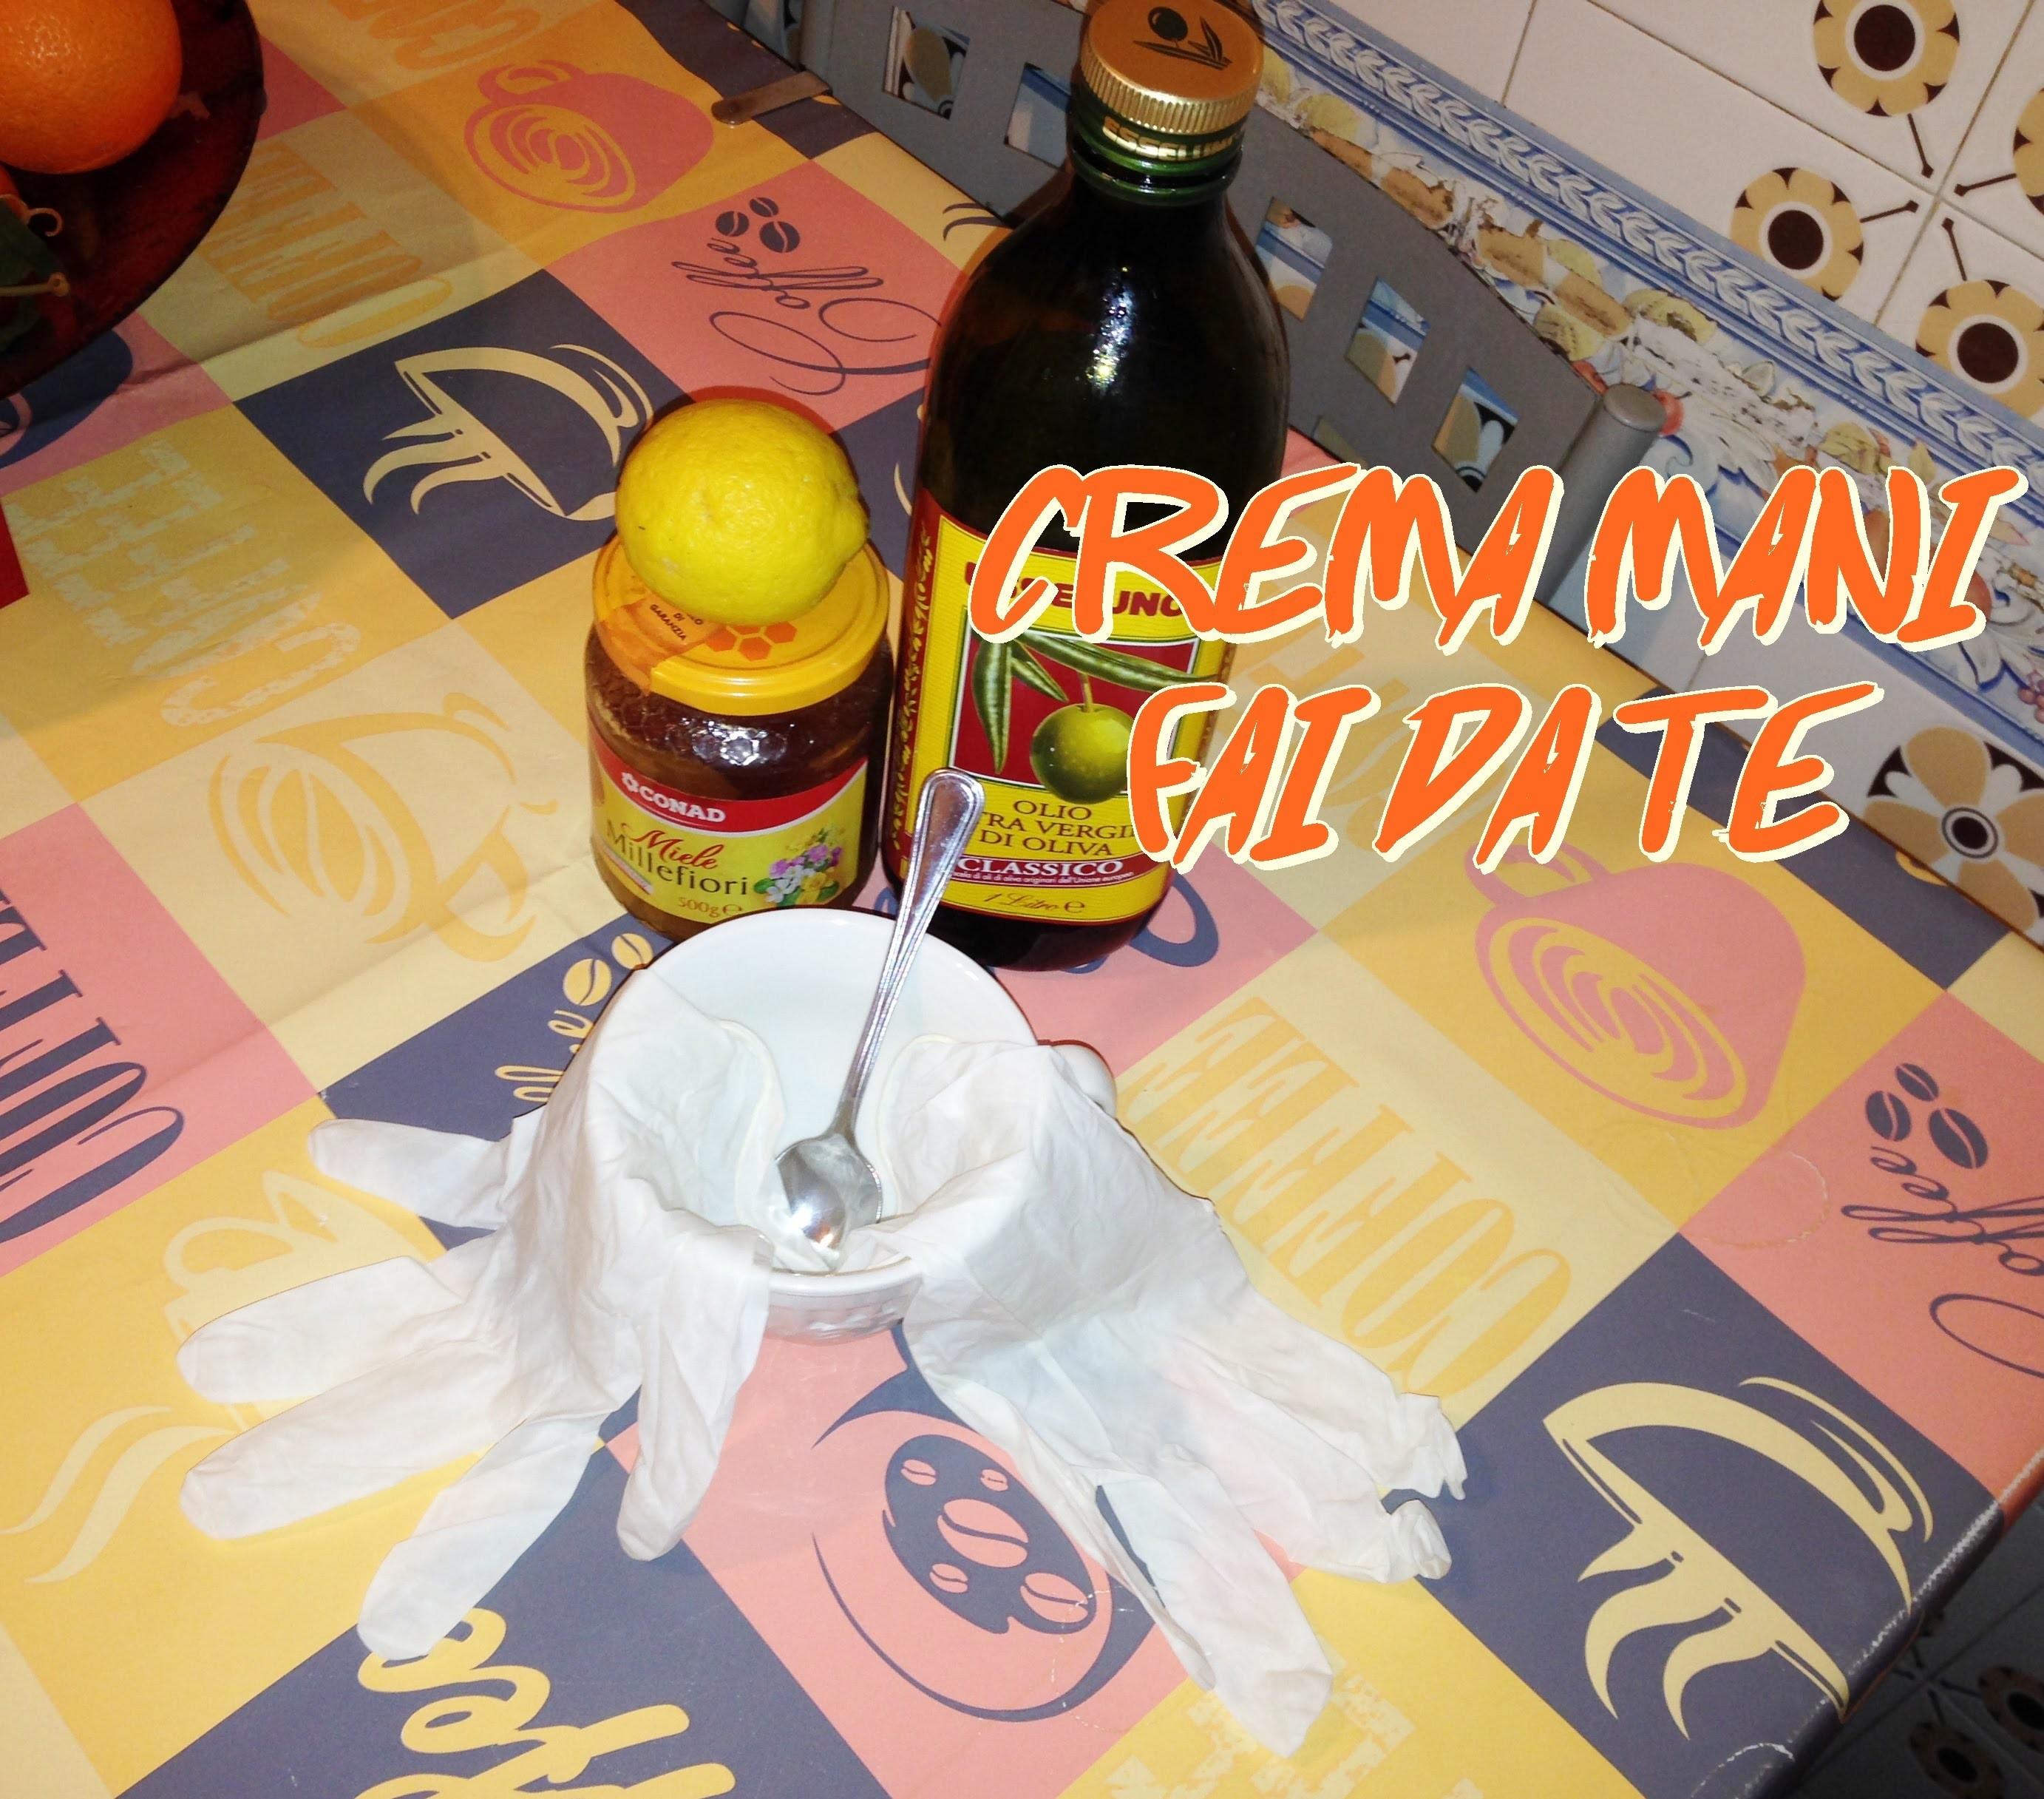 CREMA mani FAI DA TE TUTORIAL: Hand Cream DIY